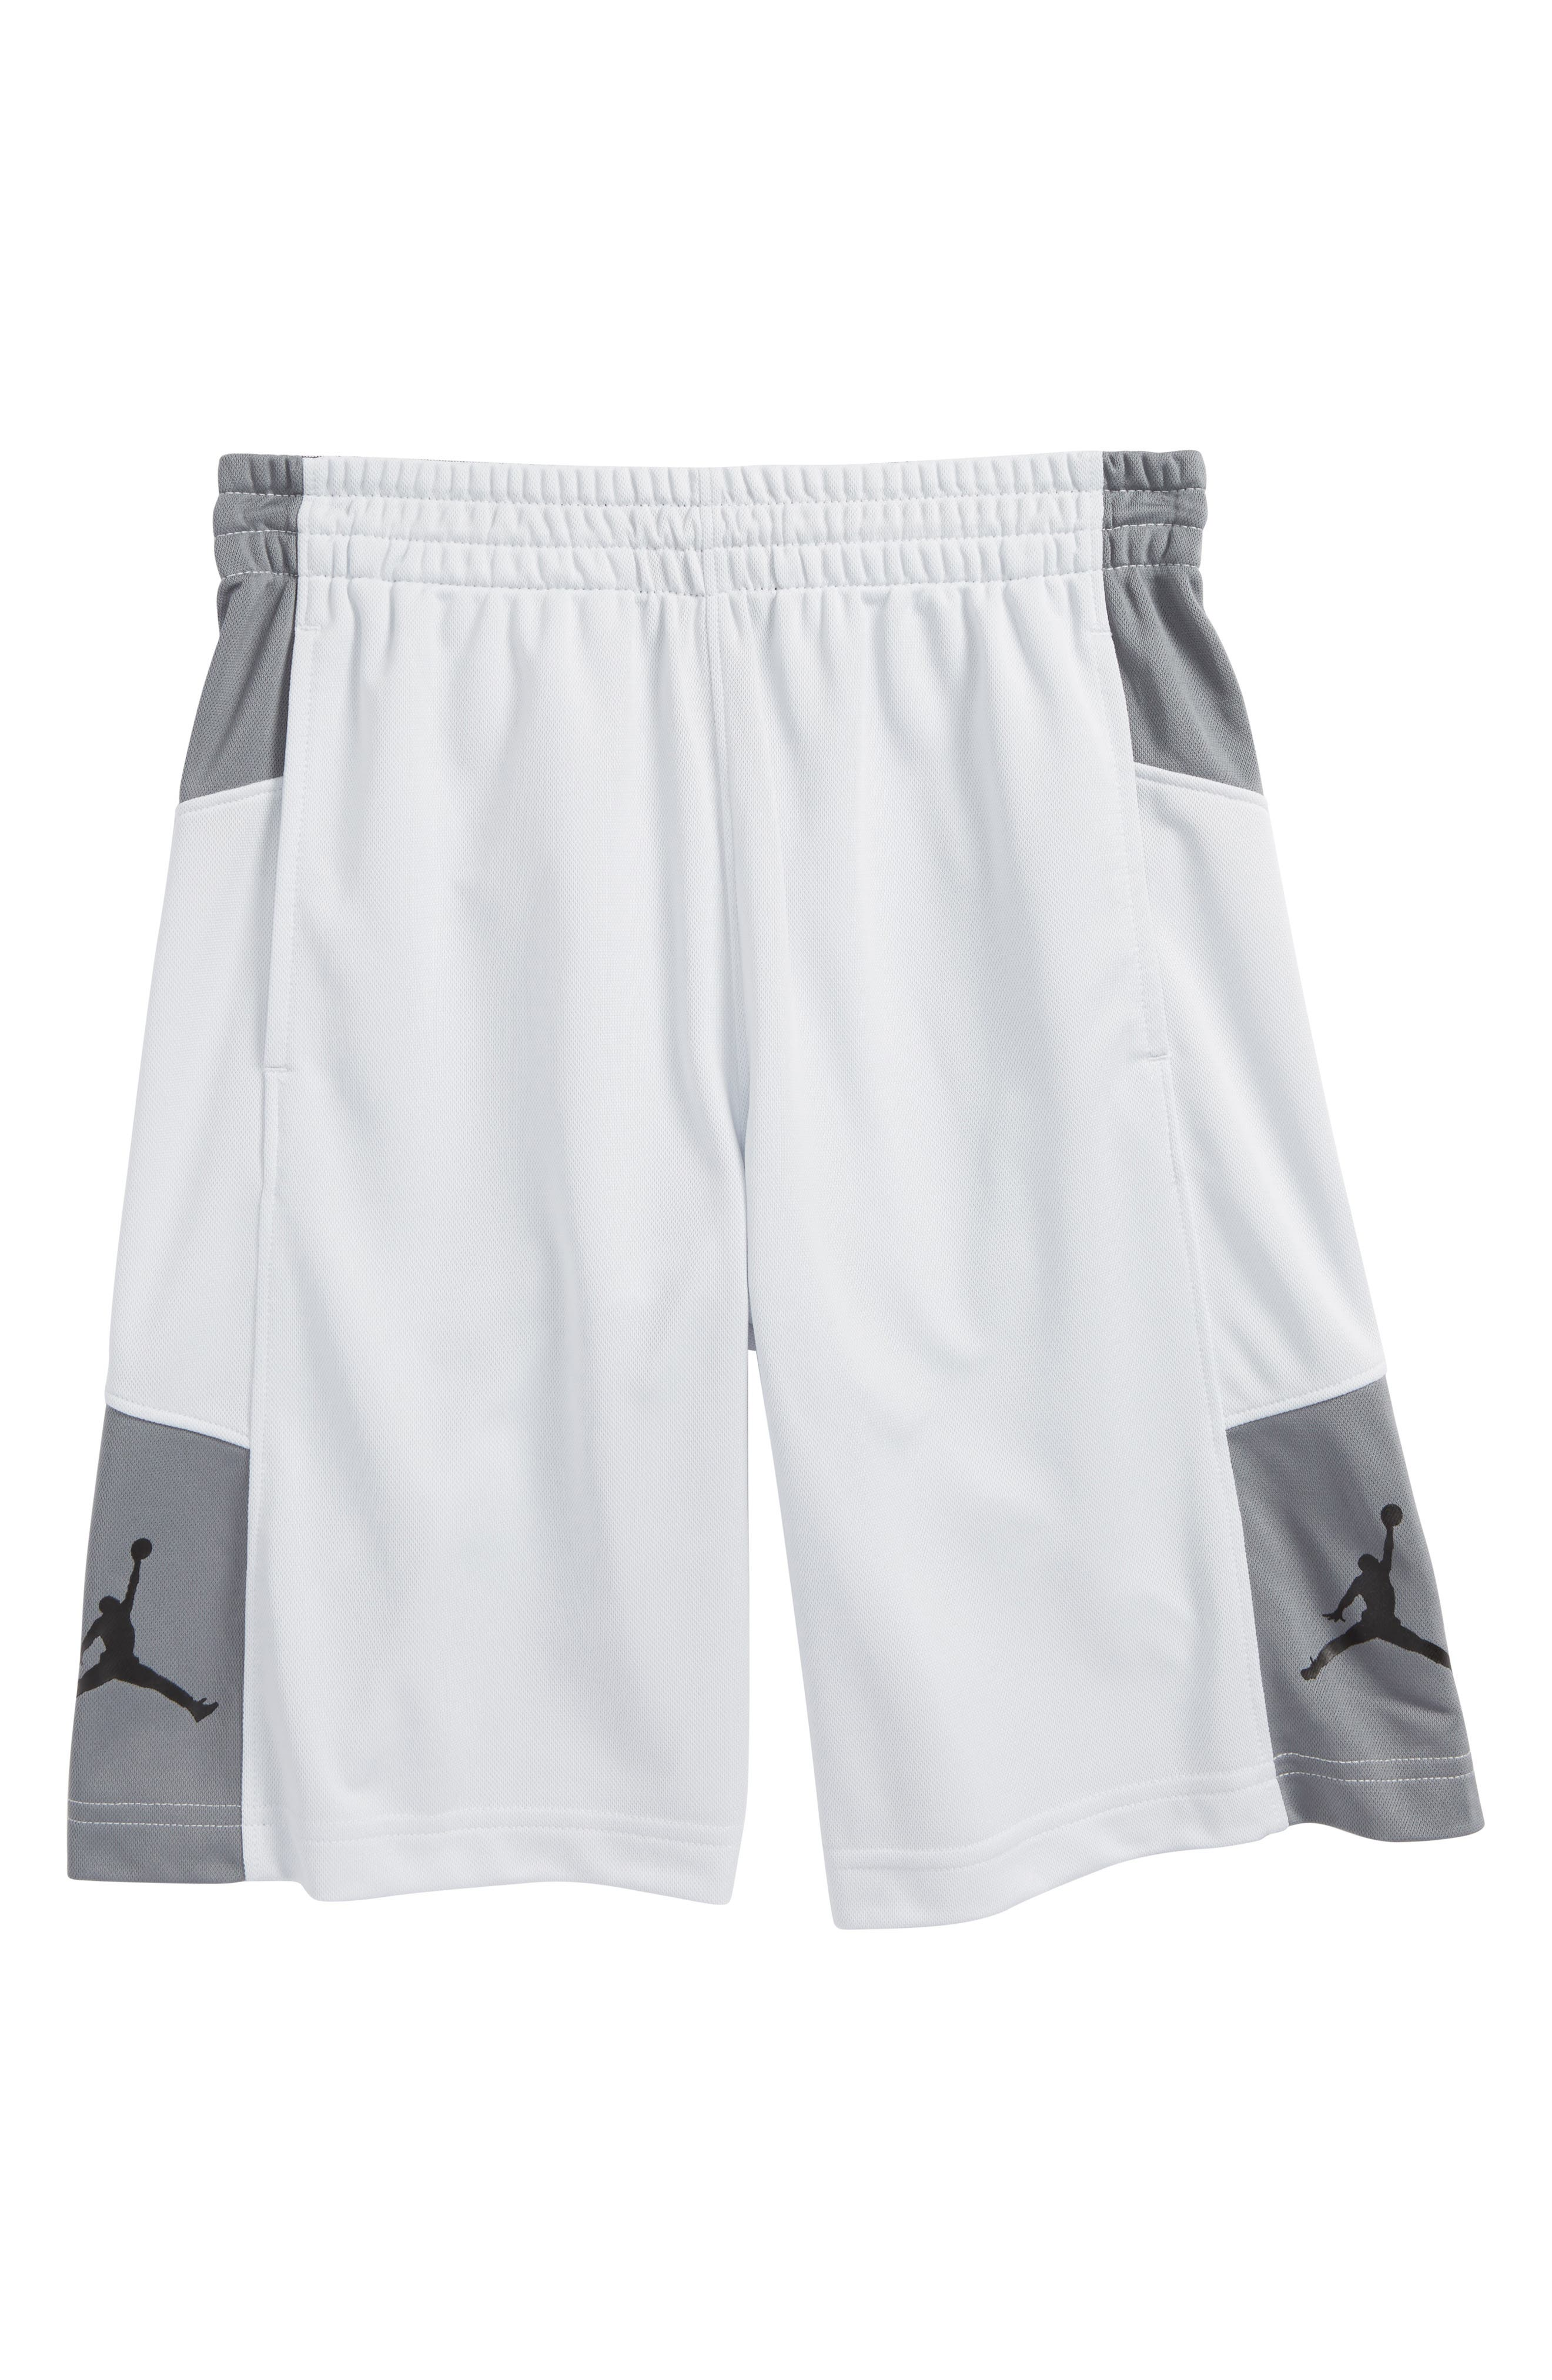 Jordan Elevate Shorts,                         Main,                         color, Pure Platinum